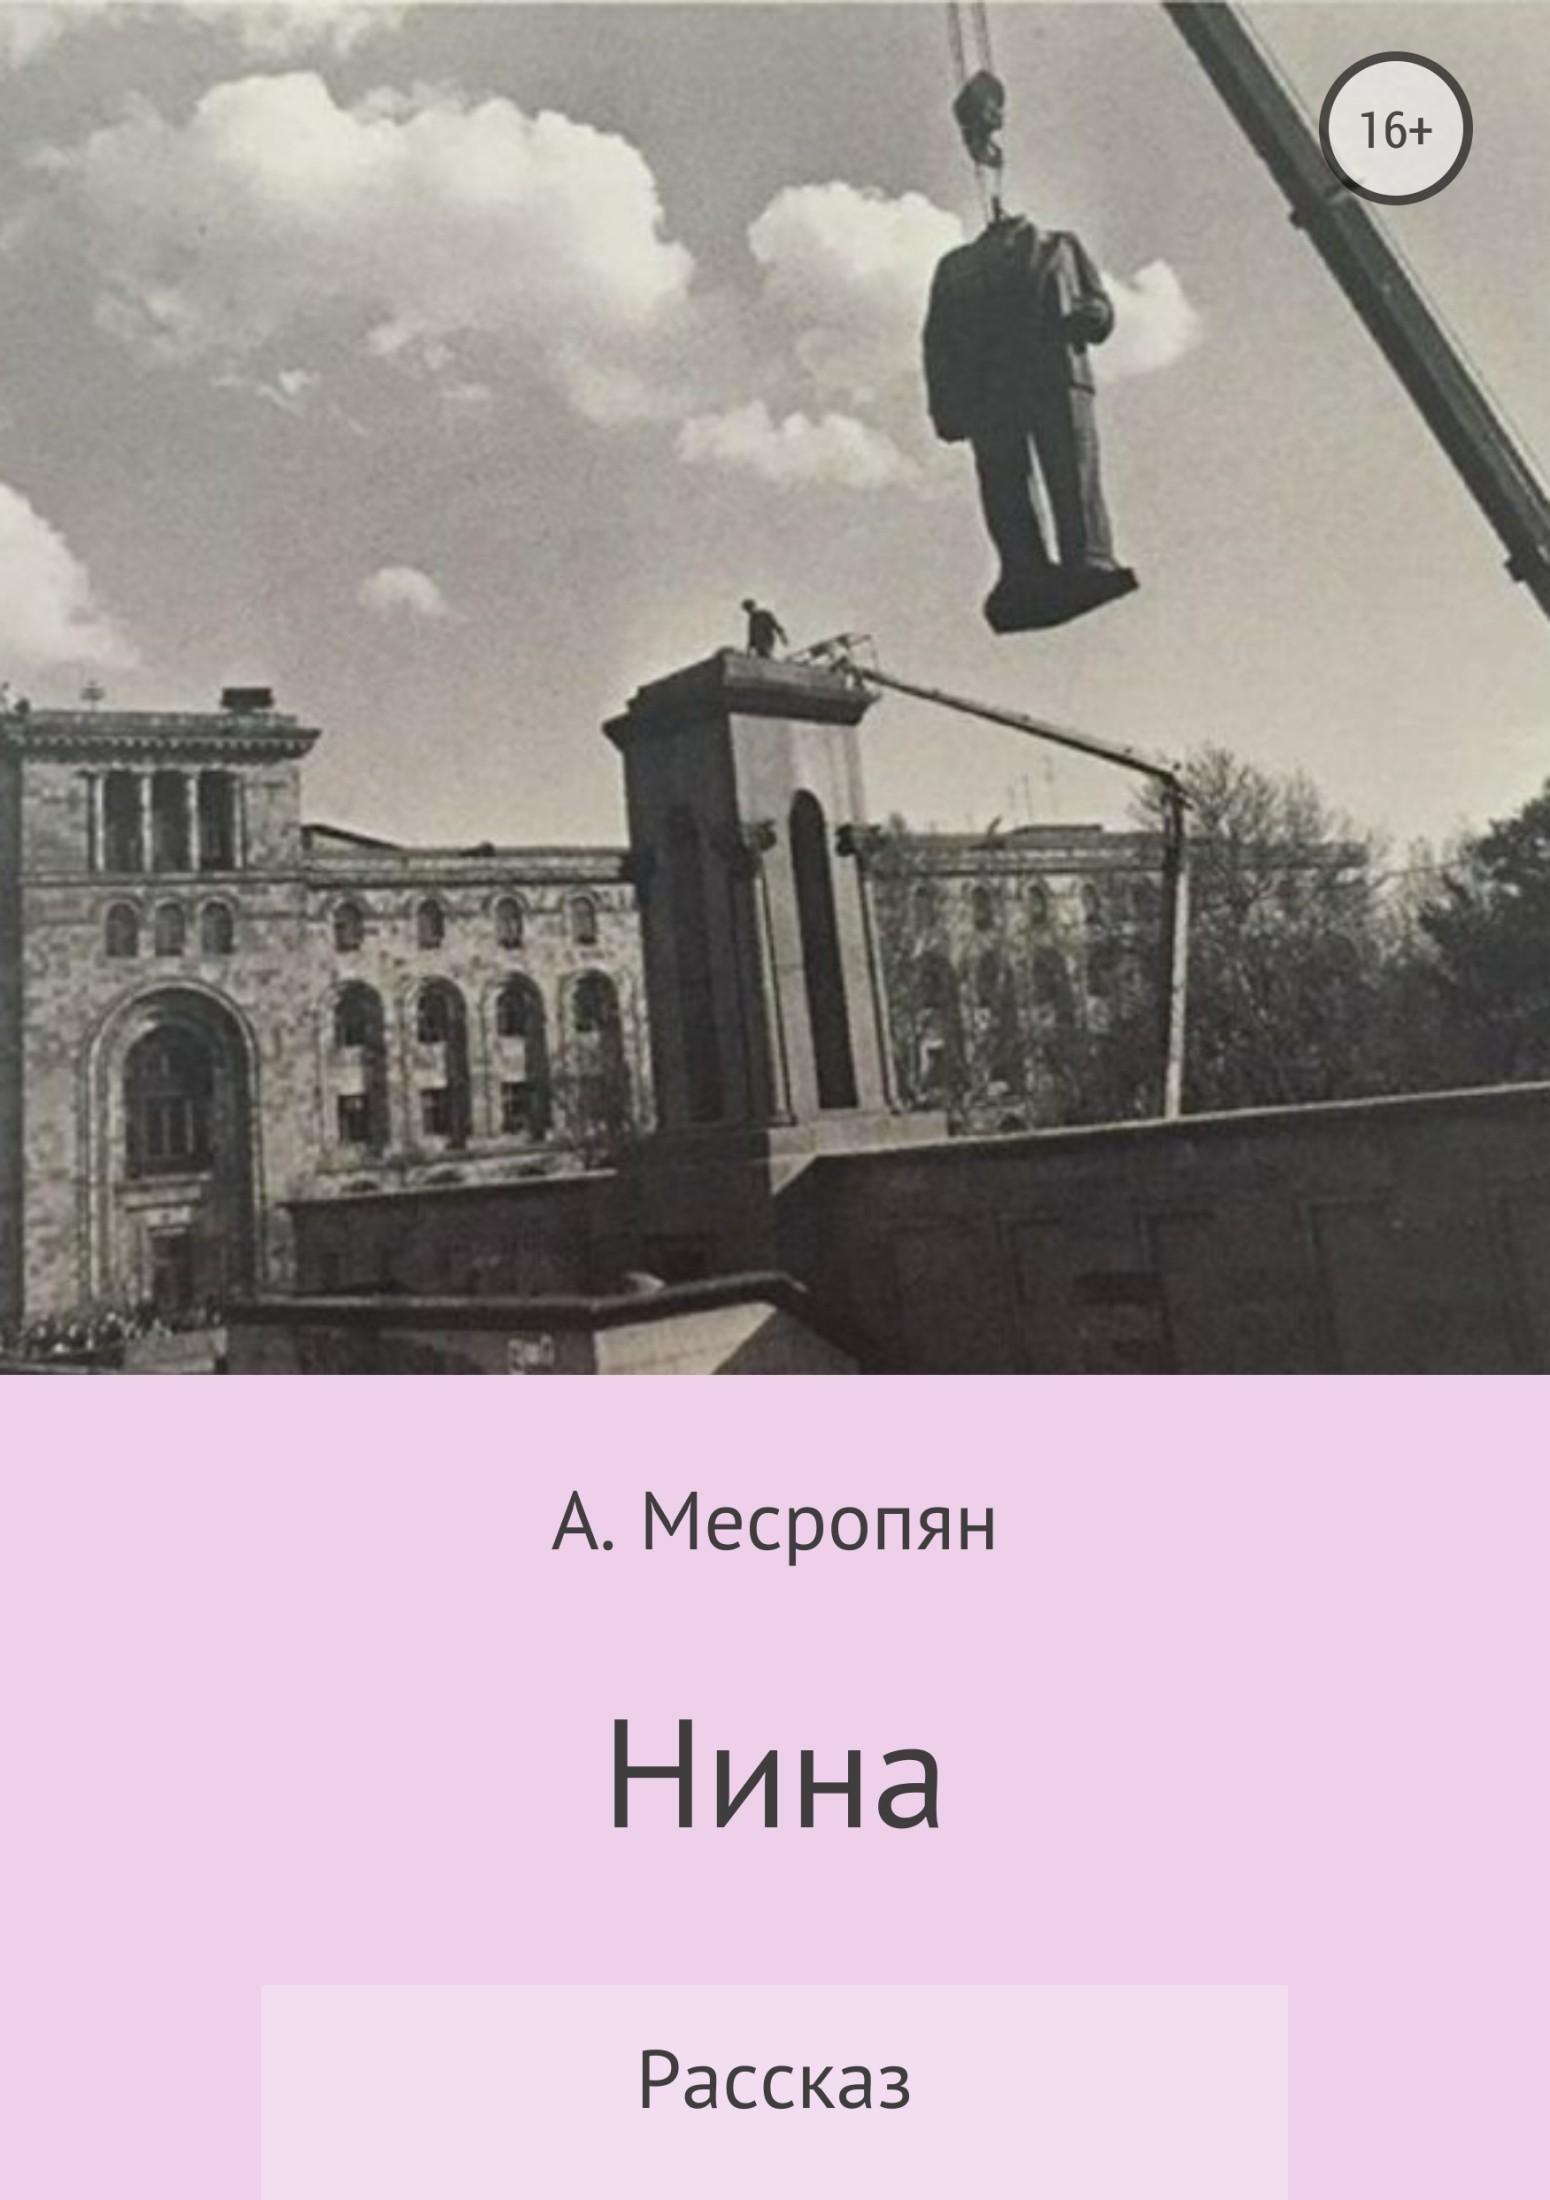 А. Месропян Ни